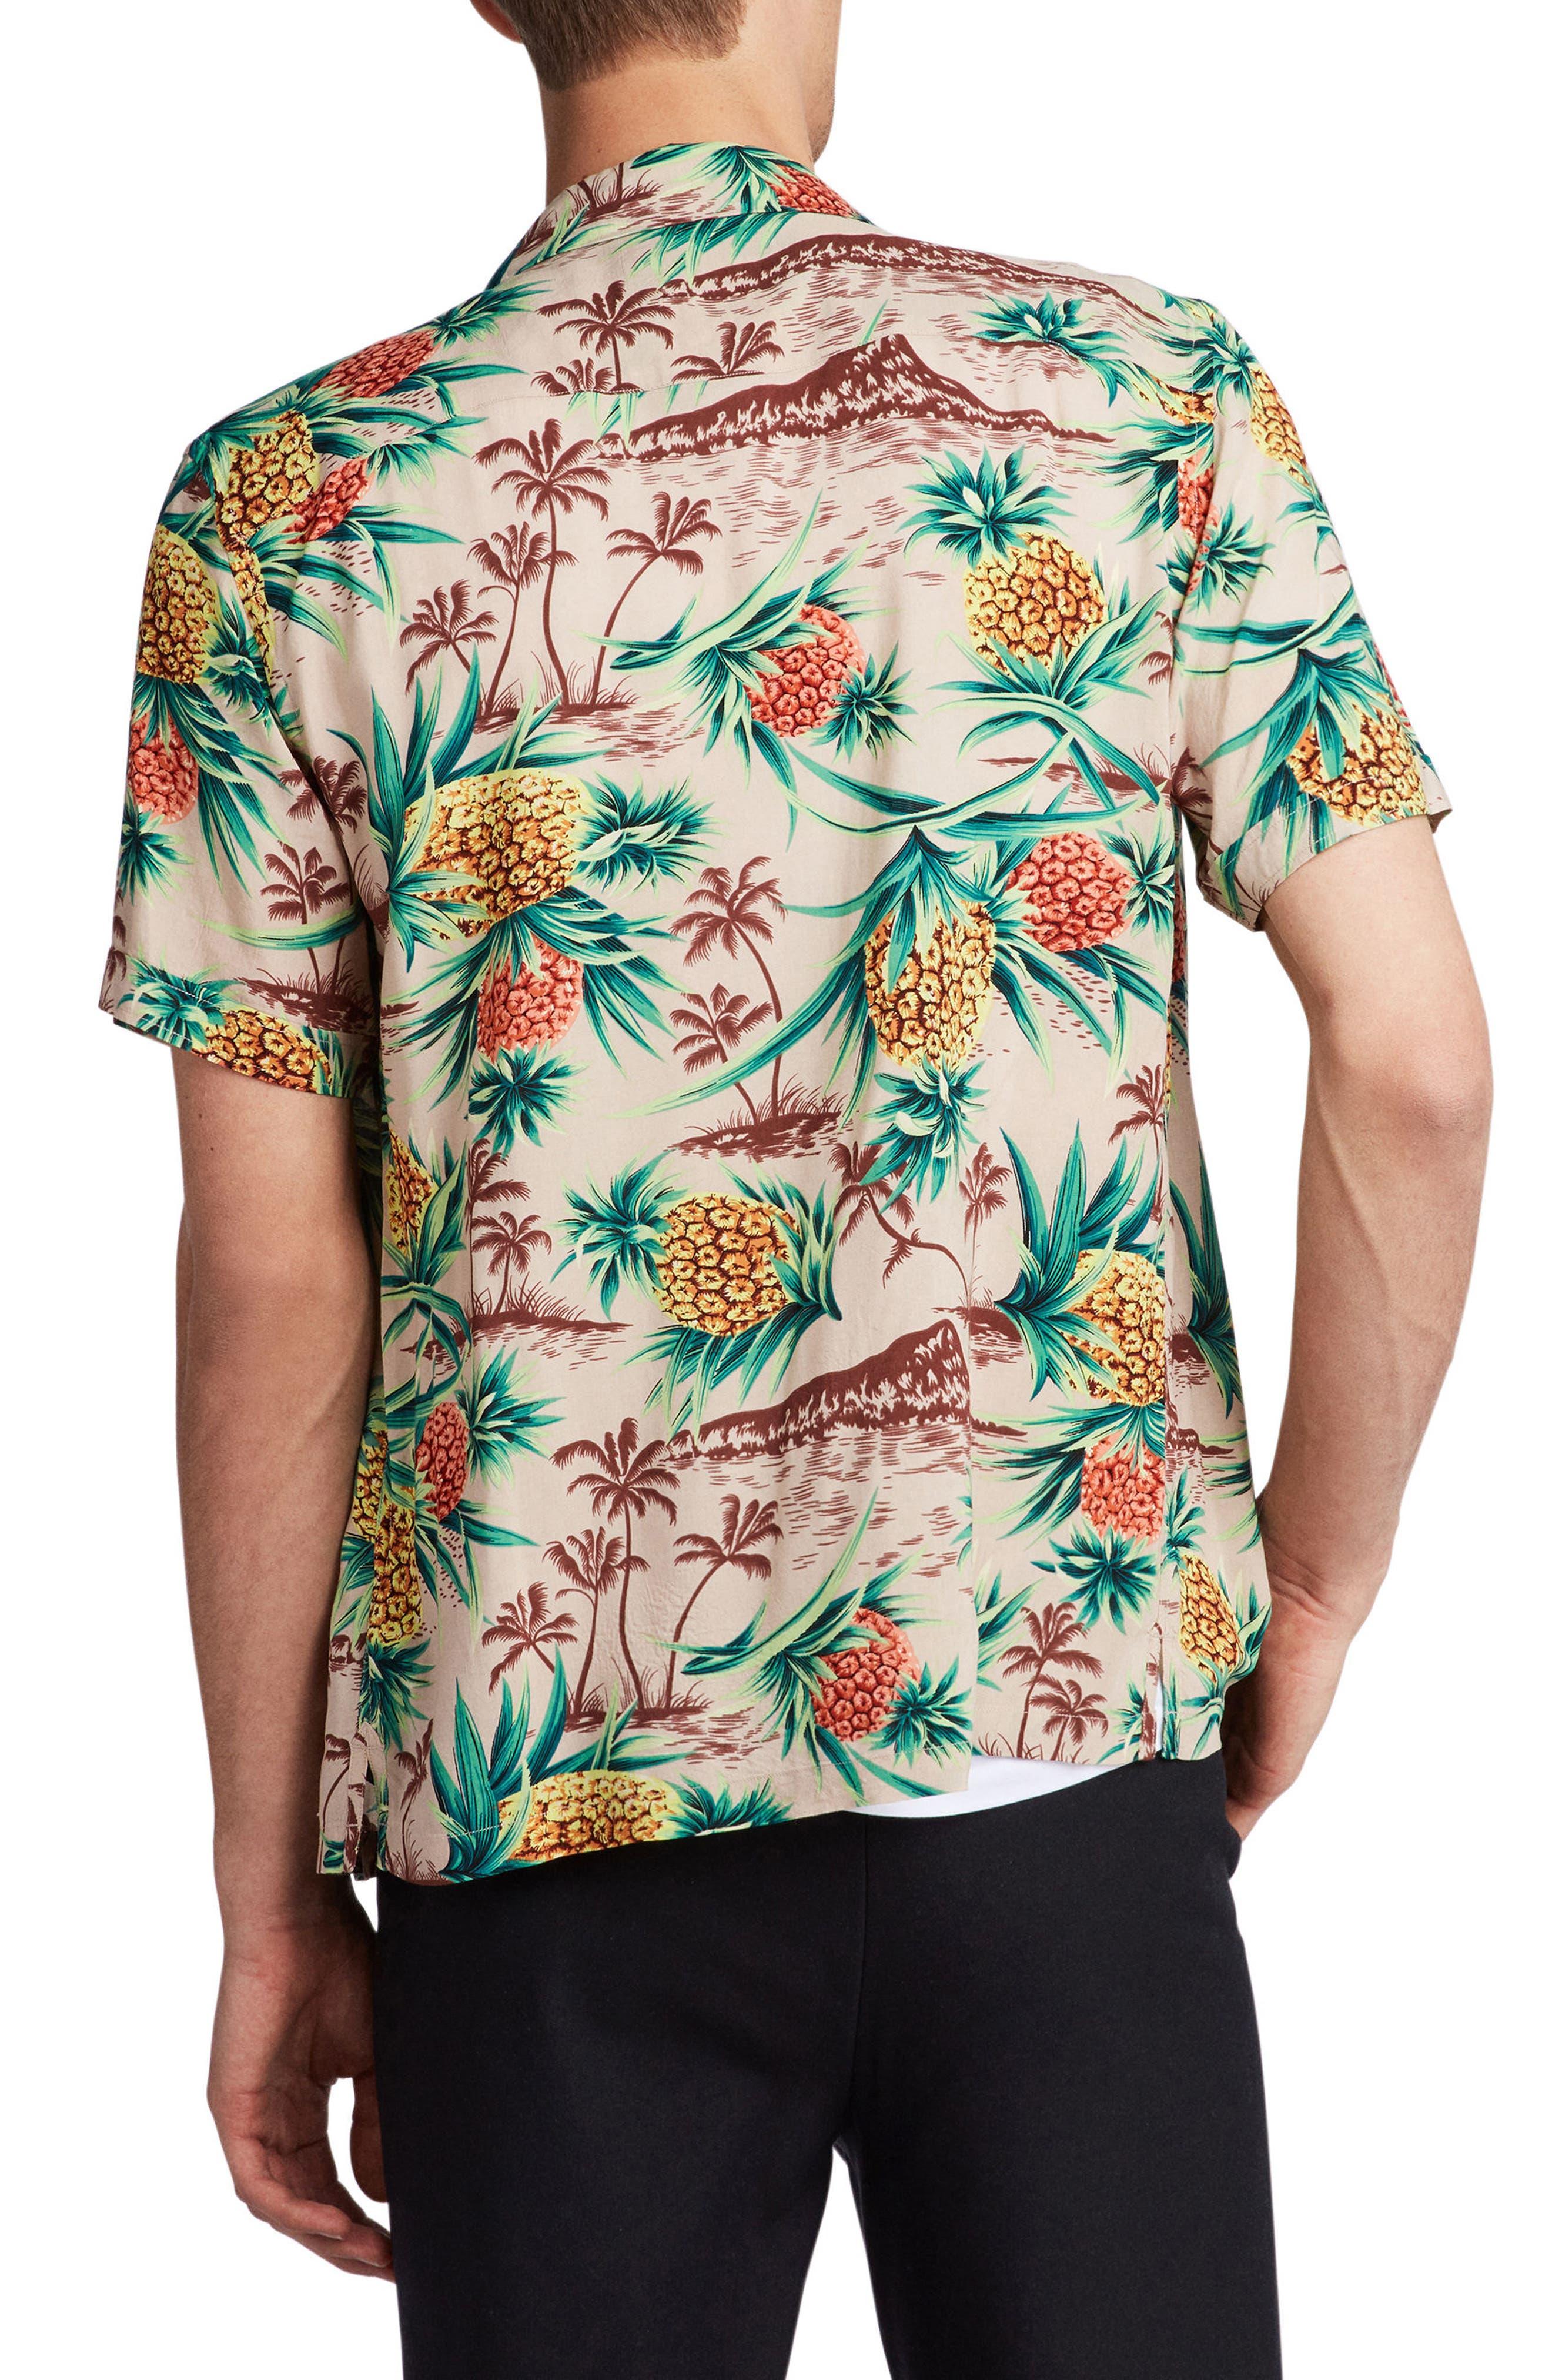 Endeavour Regular Fit Short Sleeve Sport Shirt,                             Alternate thumbnail 2, color,                             235